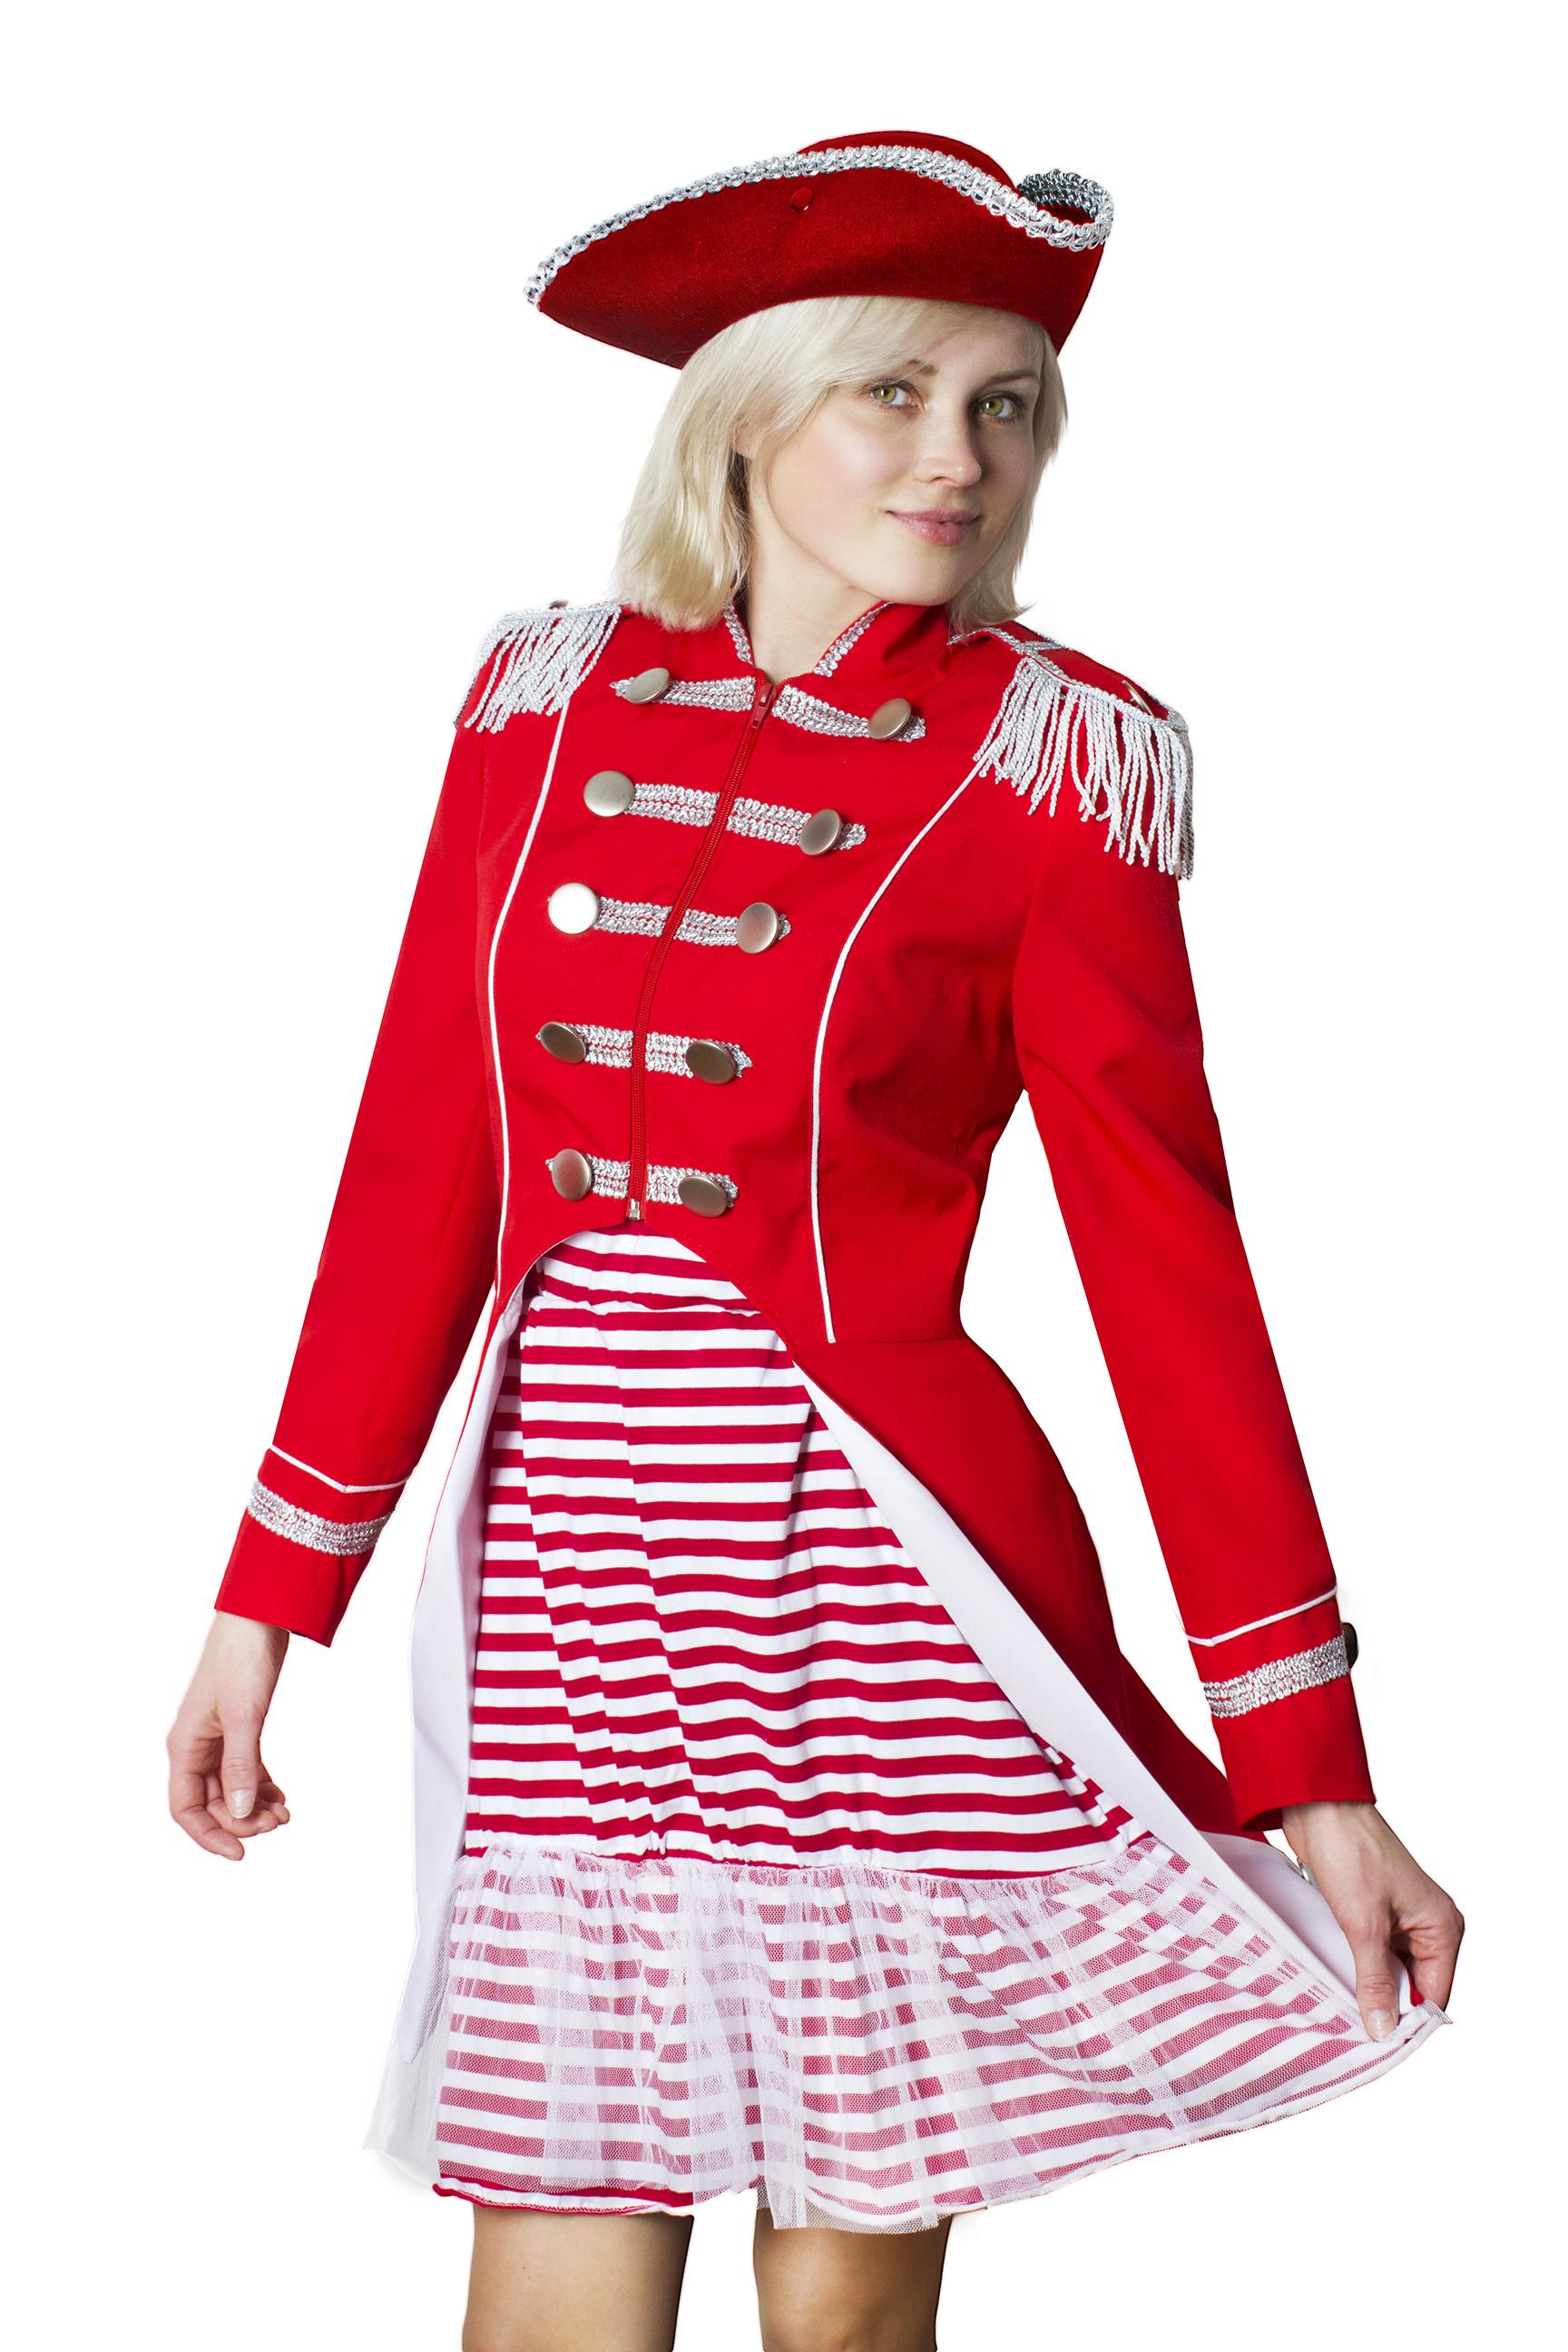 Uniform Fasching Soldat Napoleon Jacke Karnevalskostüm Gehrock Weiss Rot New